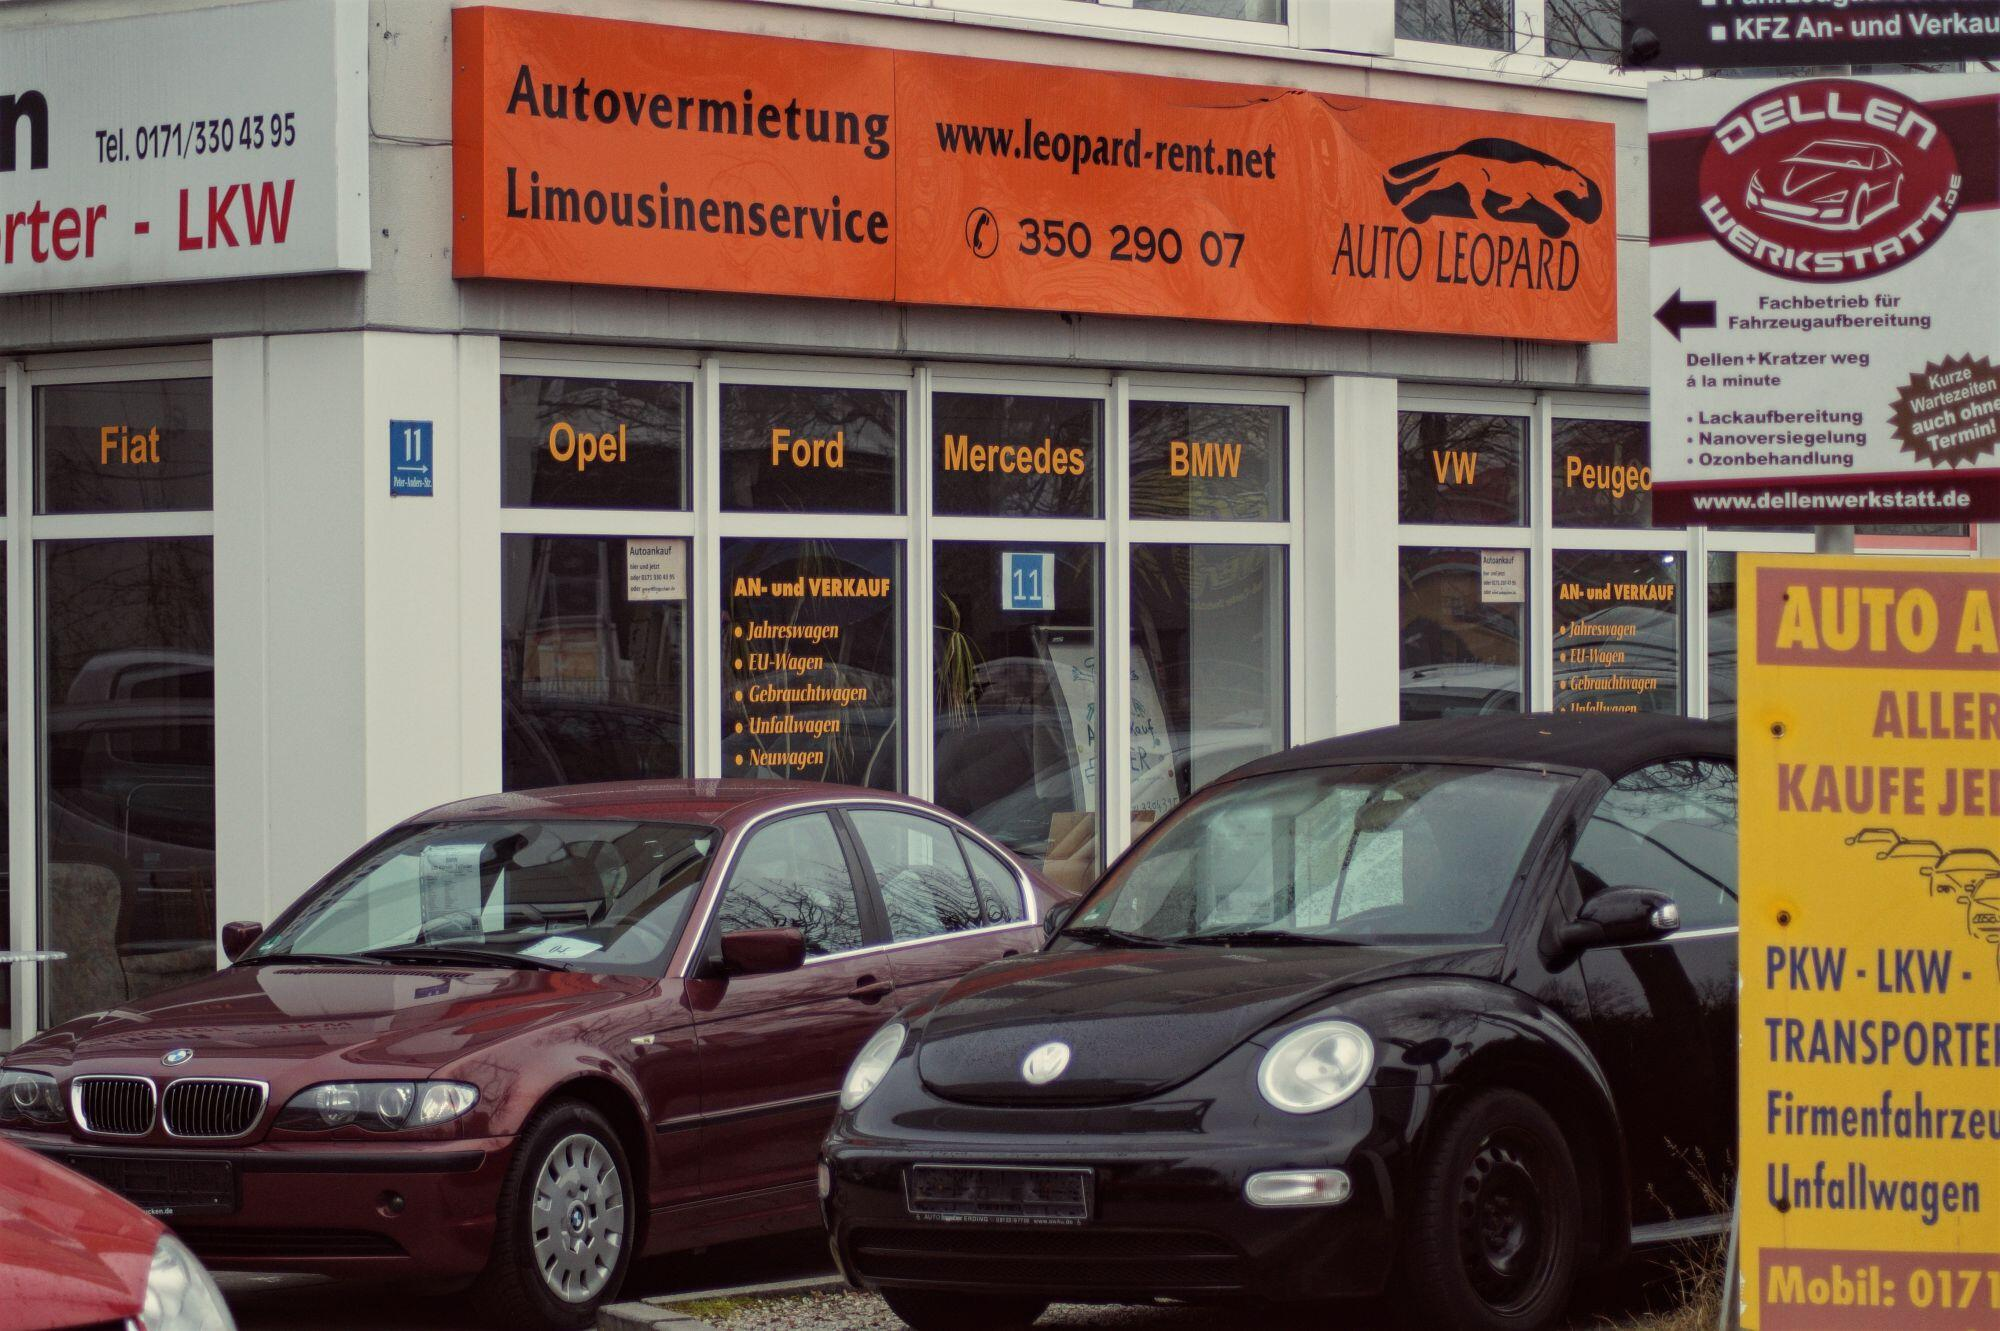 autoankauf-autoleopard-muenchen-autohaus